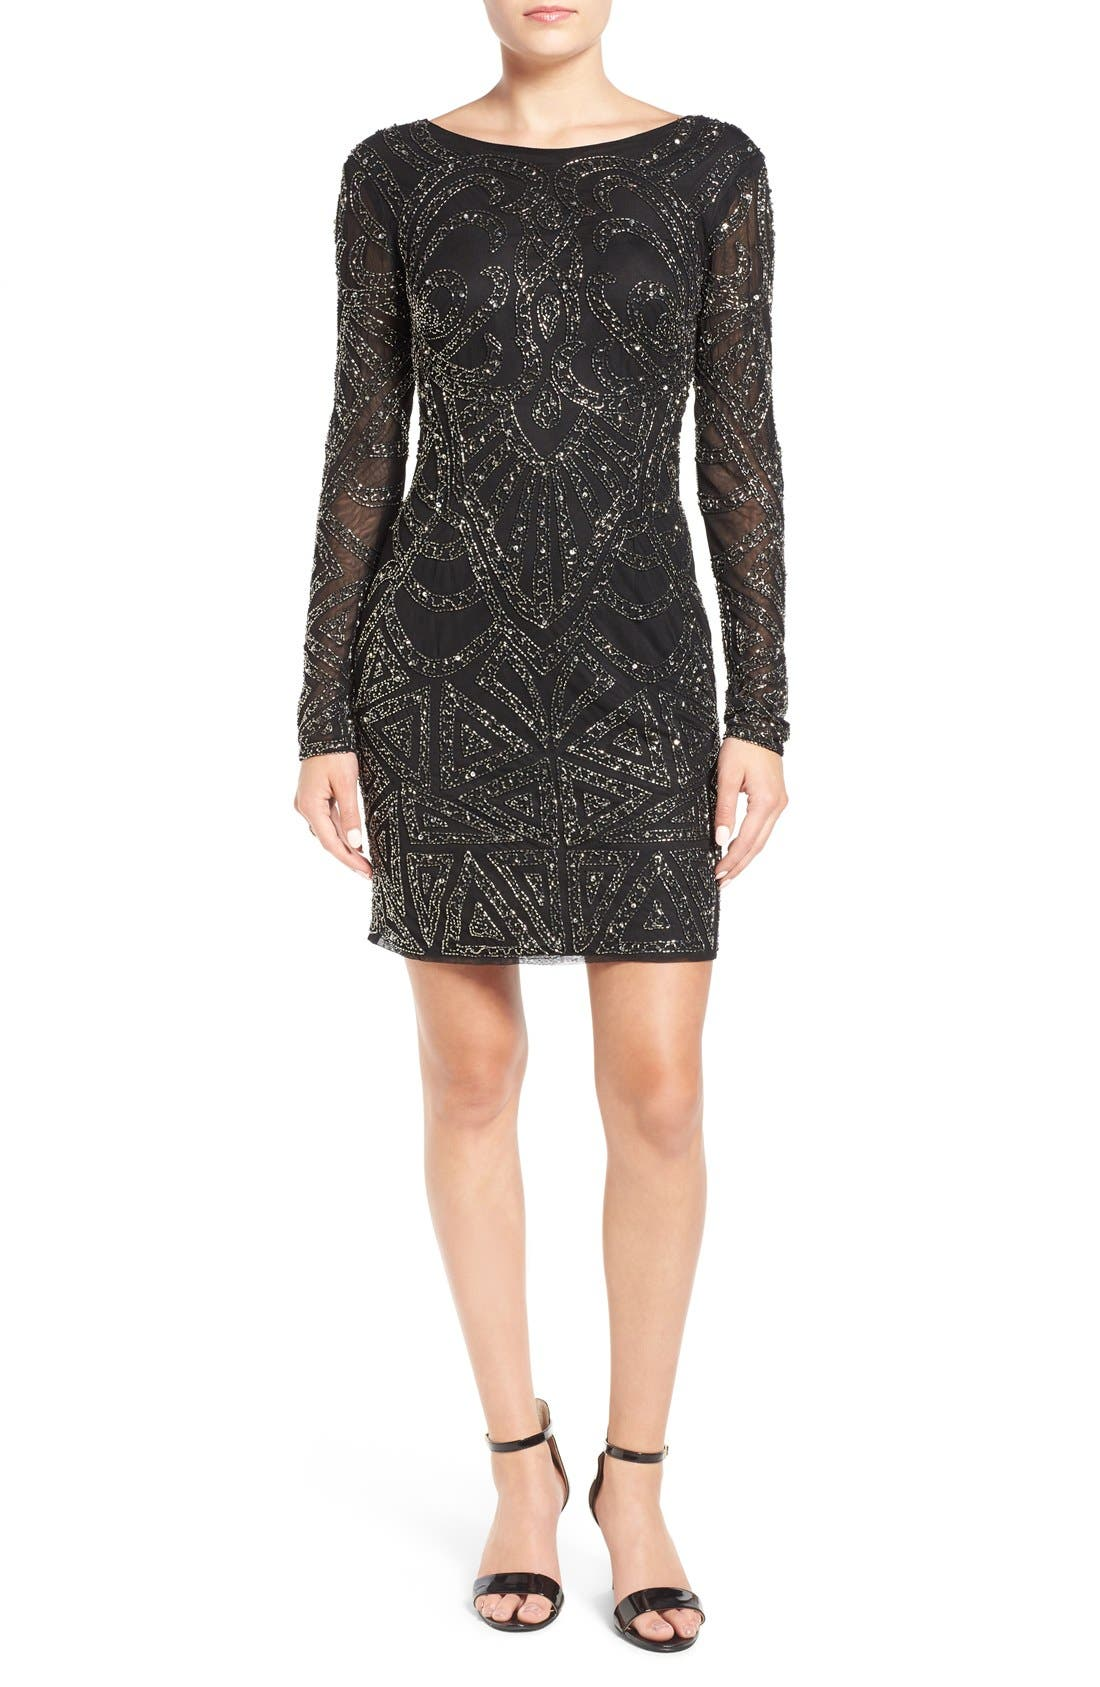 Alternate Image 1 Selected - Lace & Beads 'Brooklyn' Embellished Long Sleeve Sheath Dress